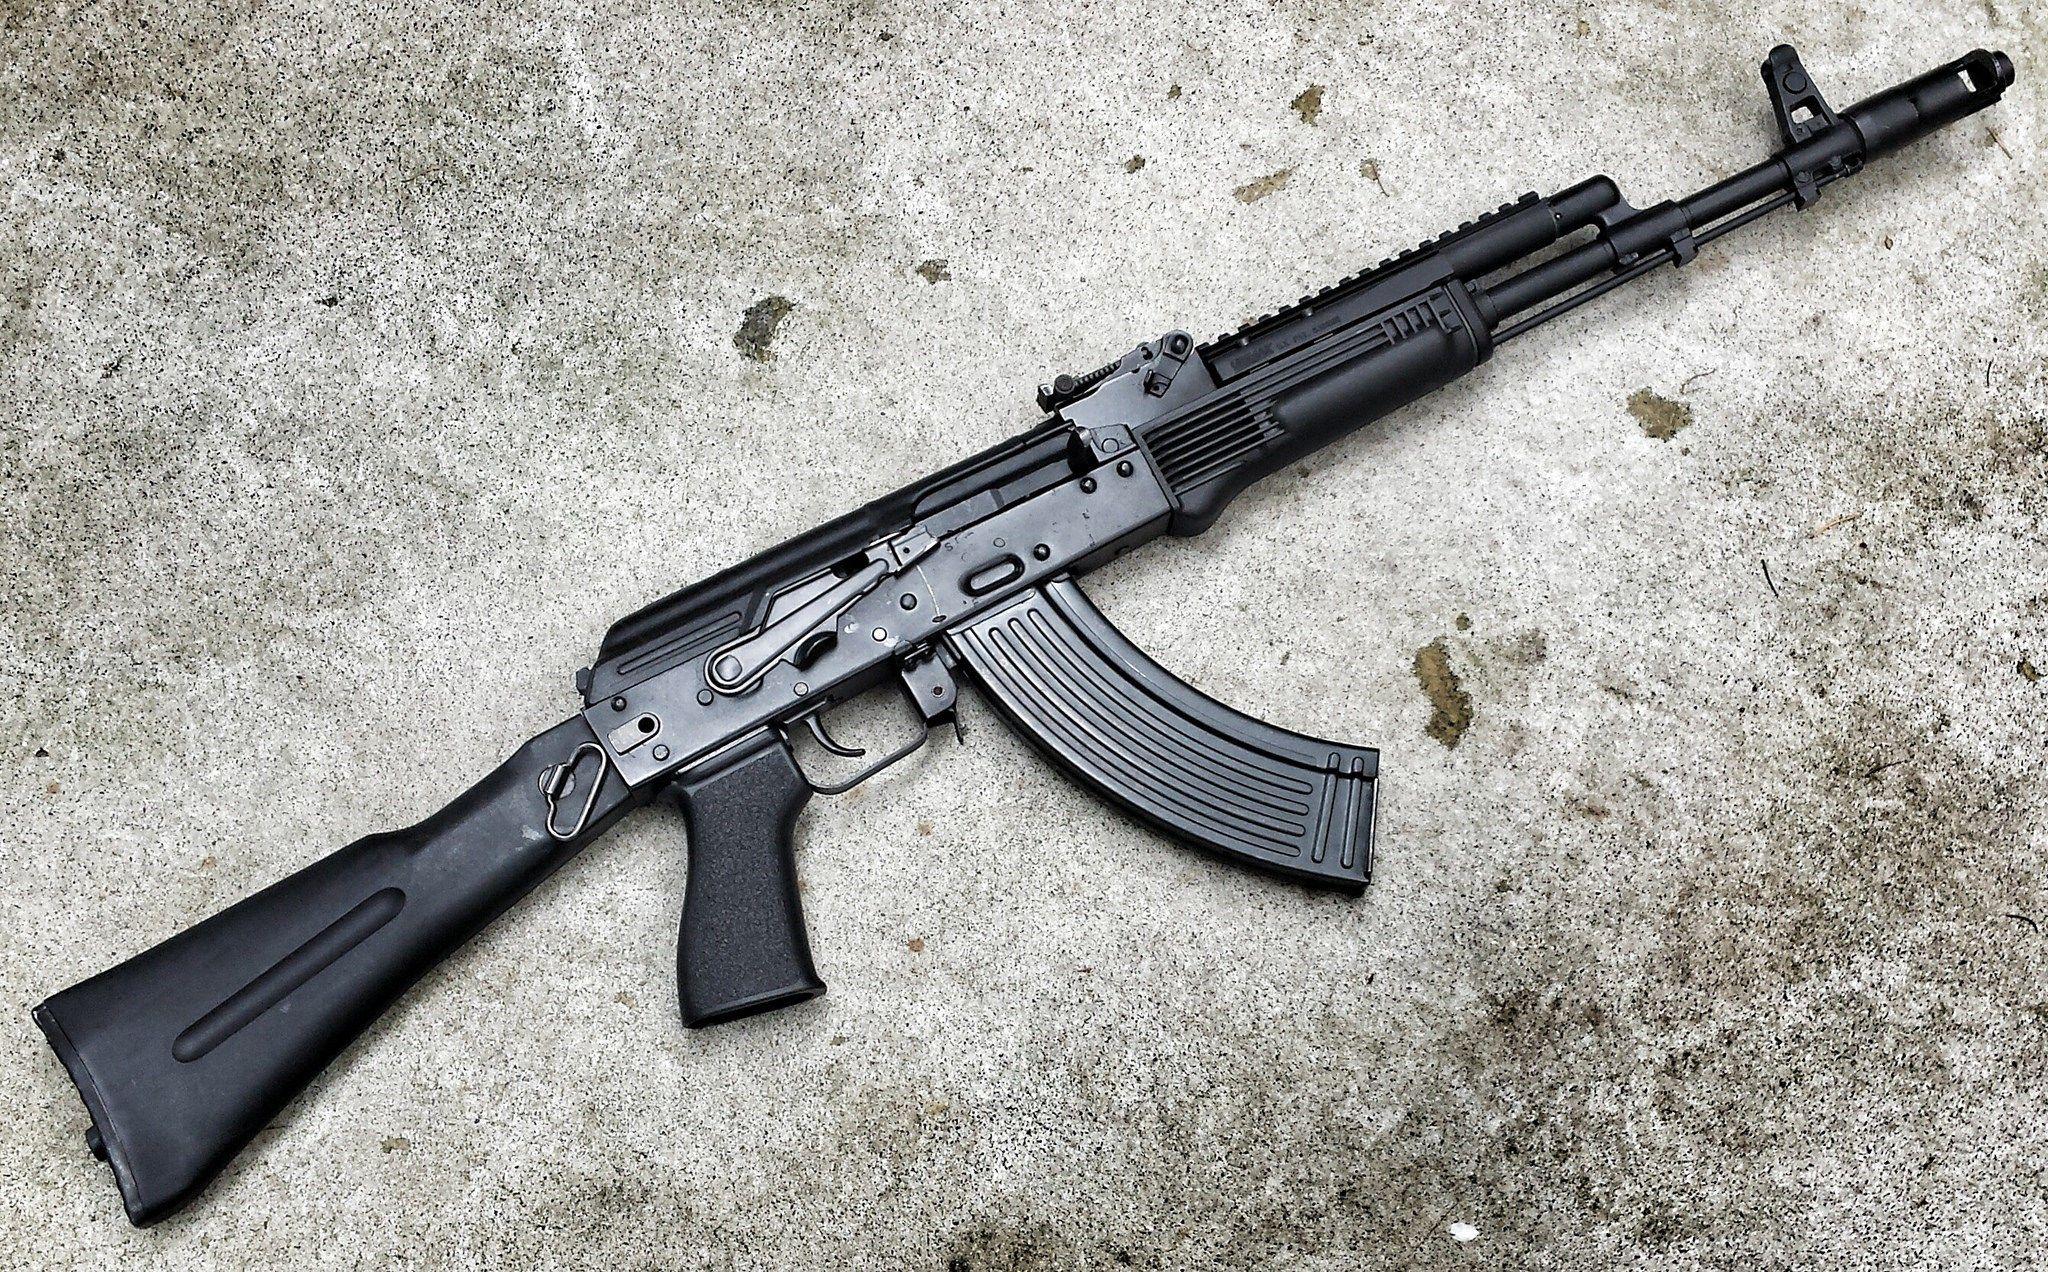 2048x1272 Px Ak 47 Rifle Wallpaper Free Hd Widescreen By Ditte Little